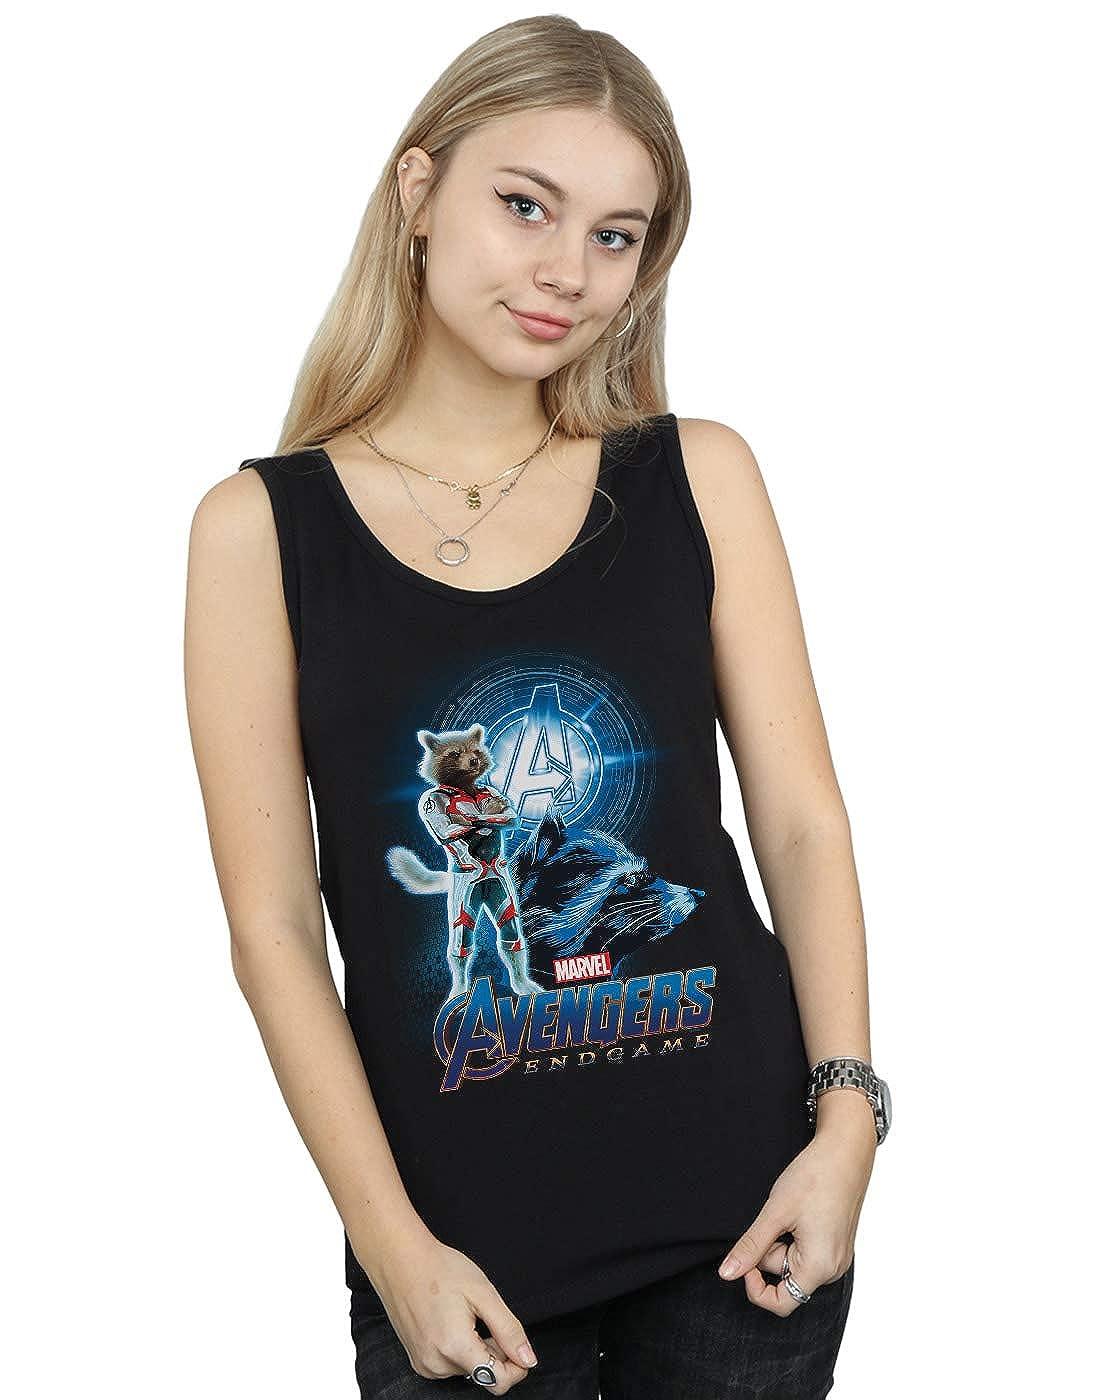 Marvel Femme Avengers Endgame Rocket Team Suit Tank Top